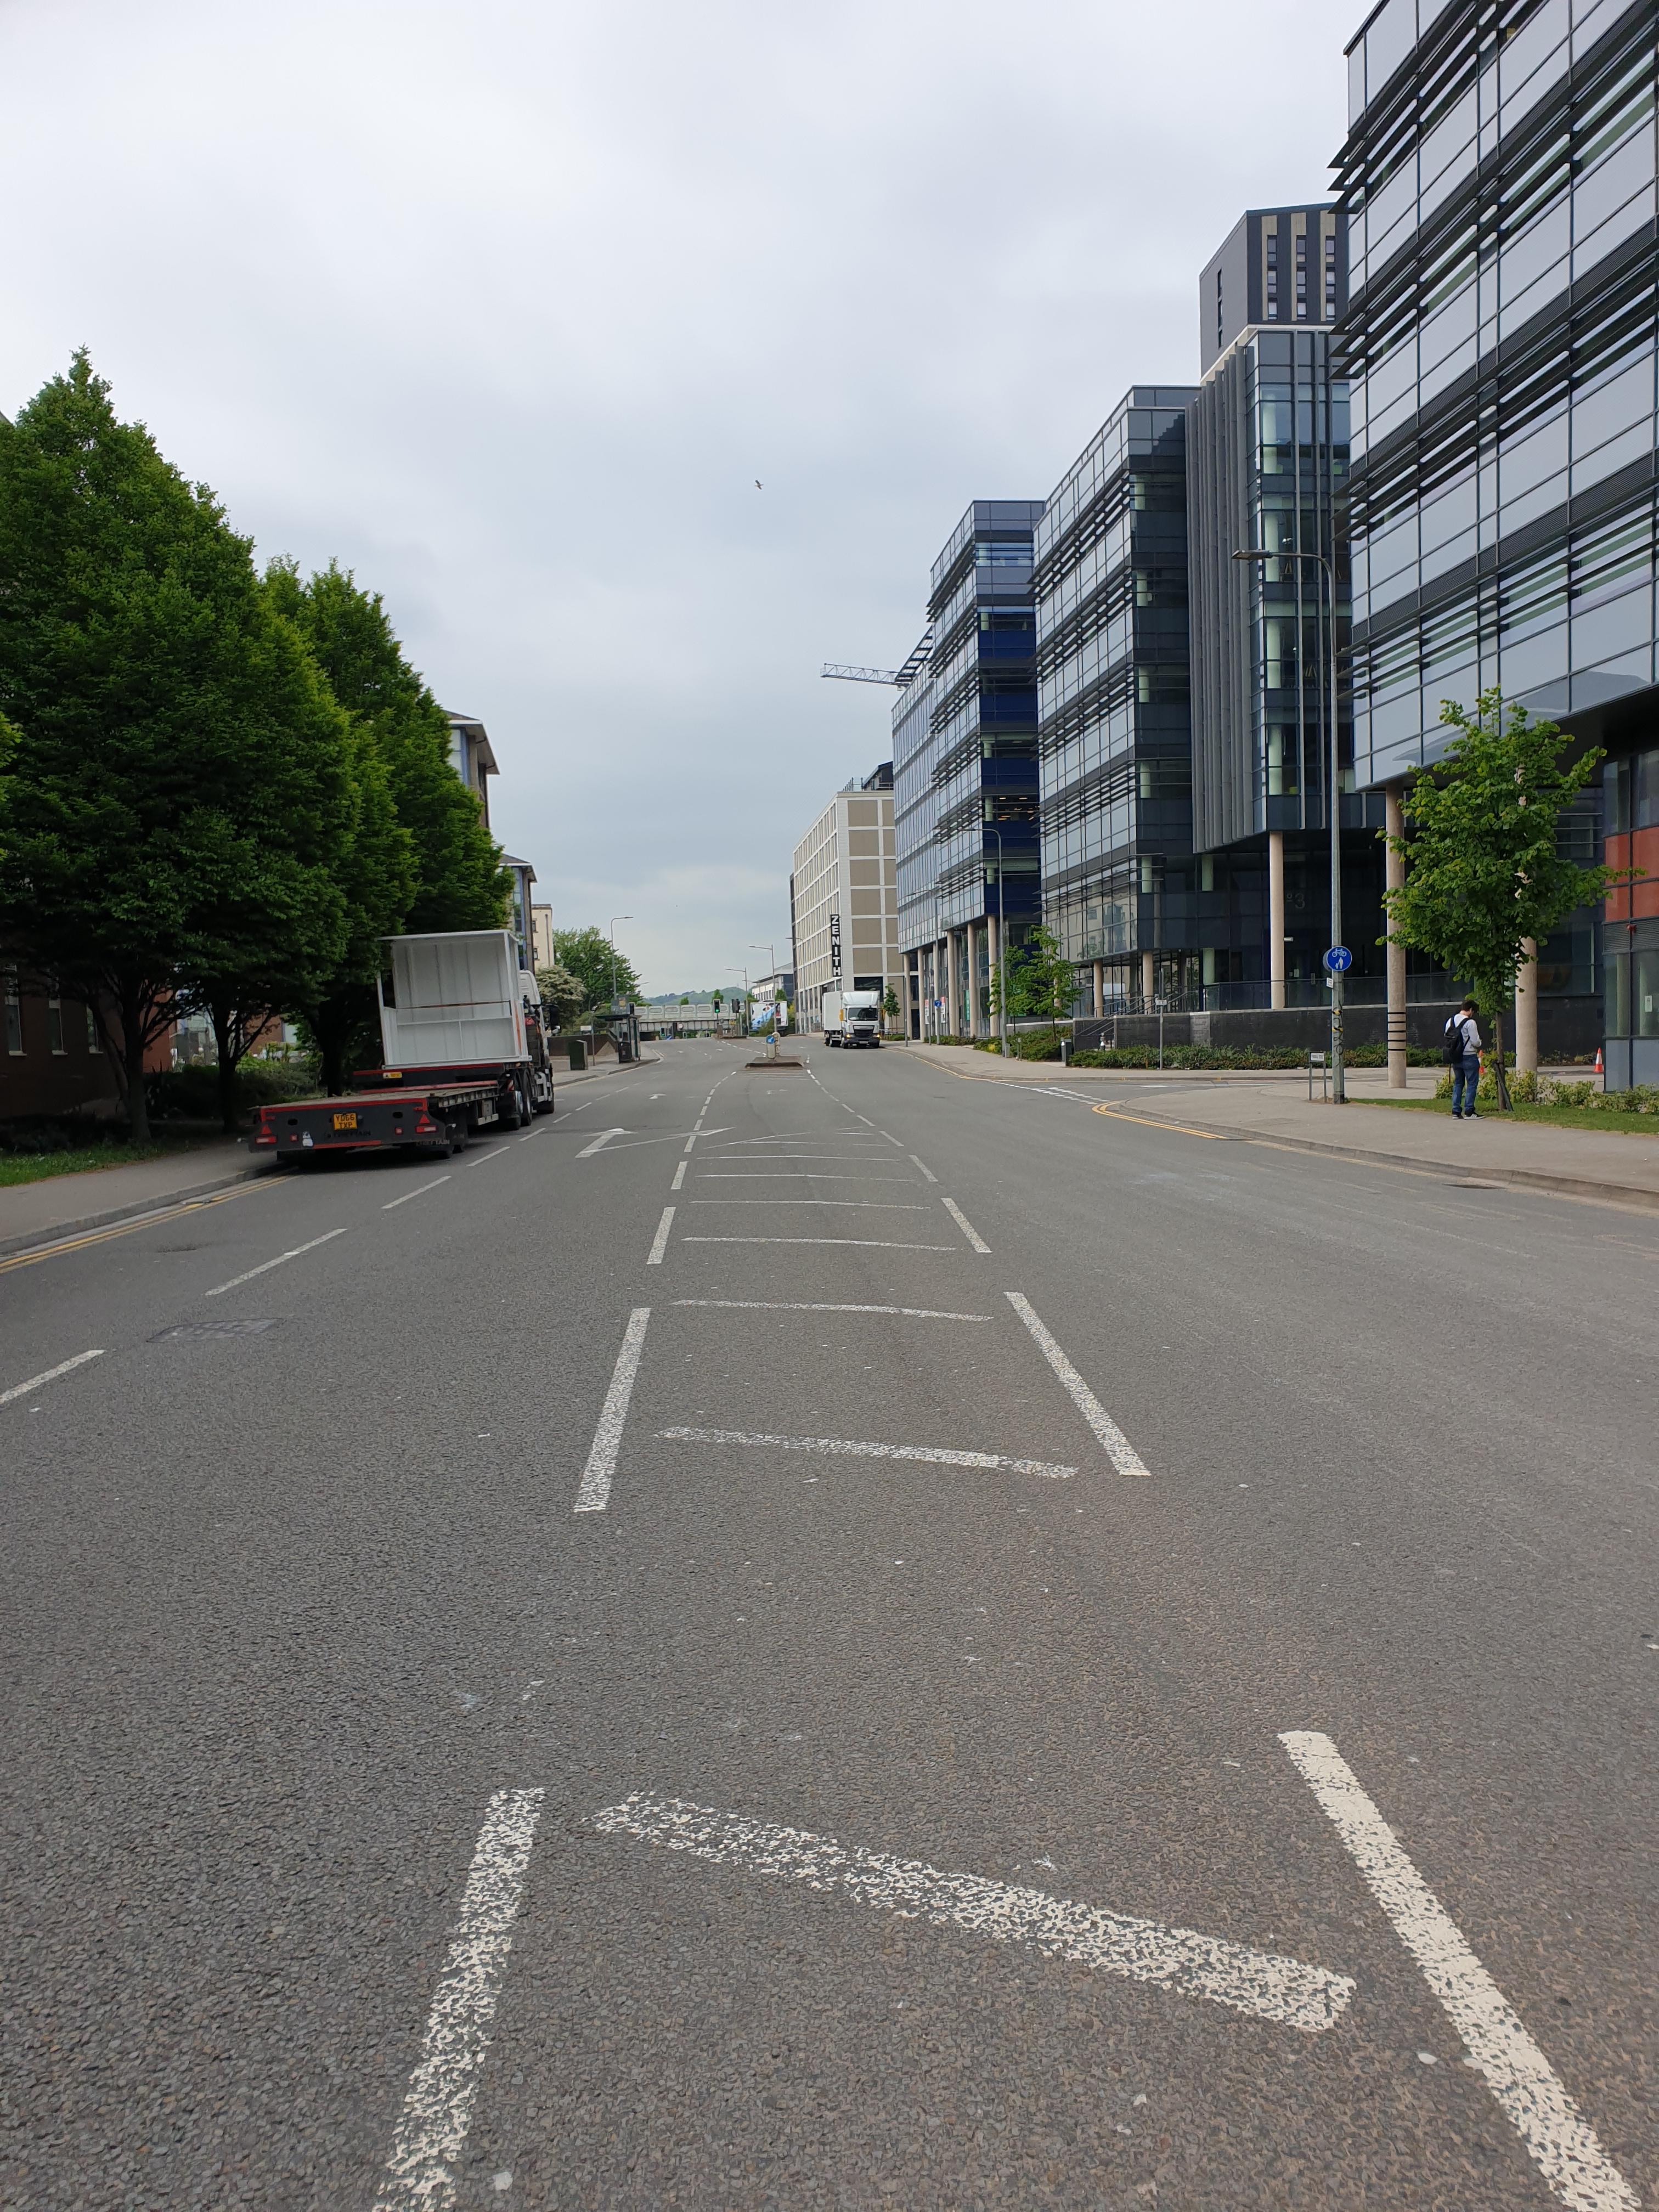 Tindall Street